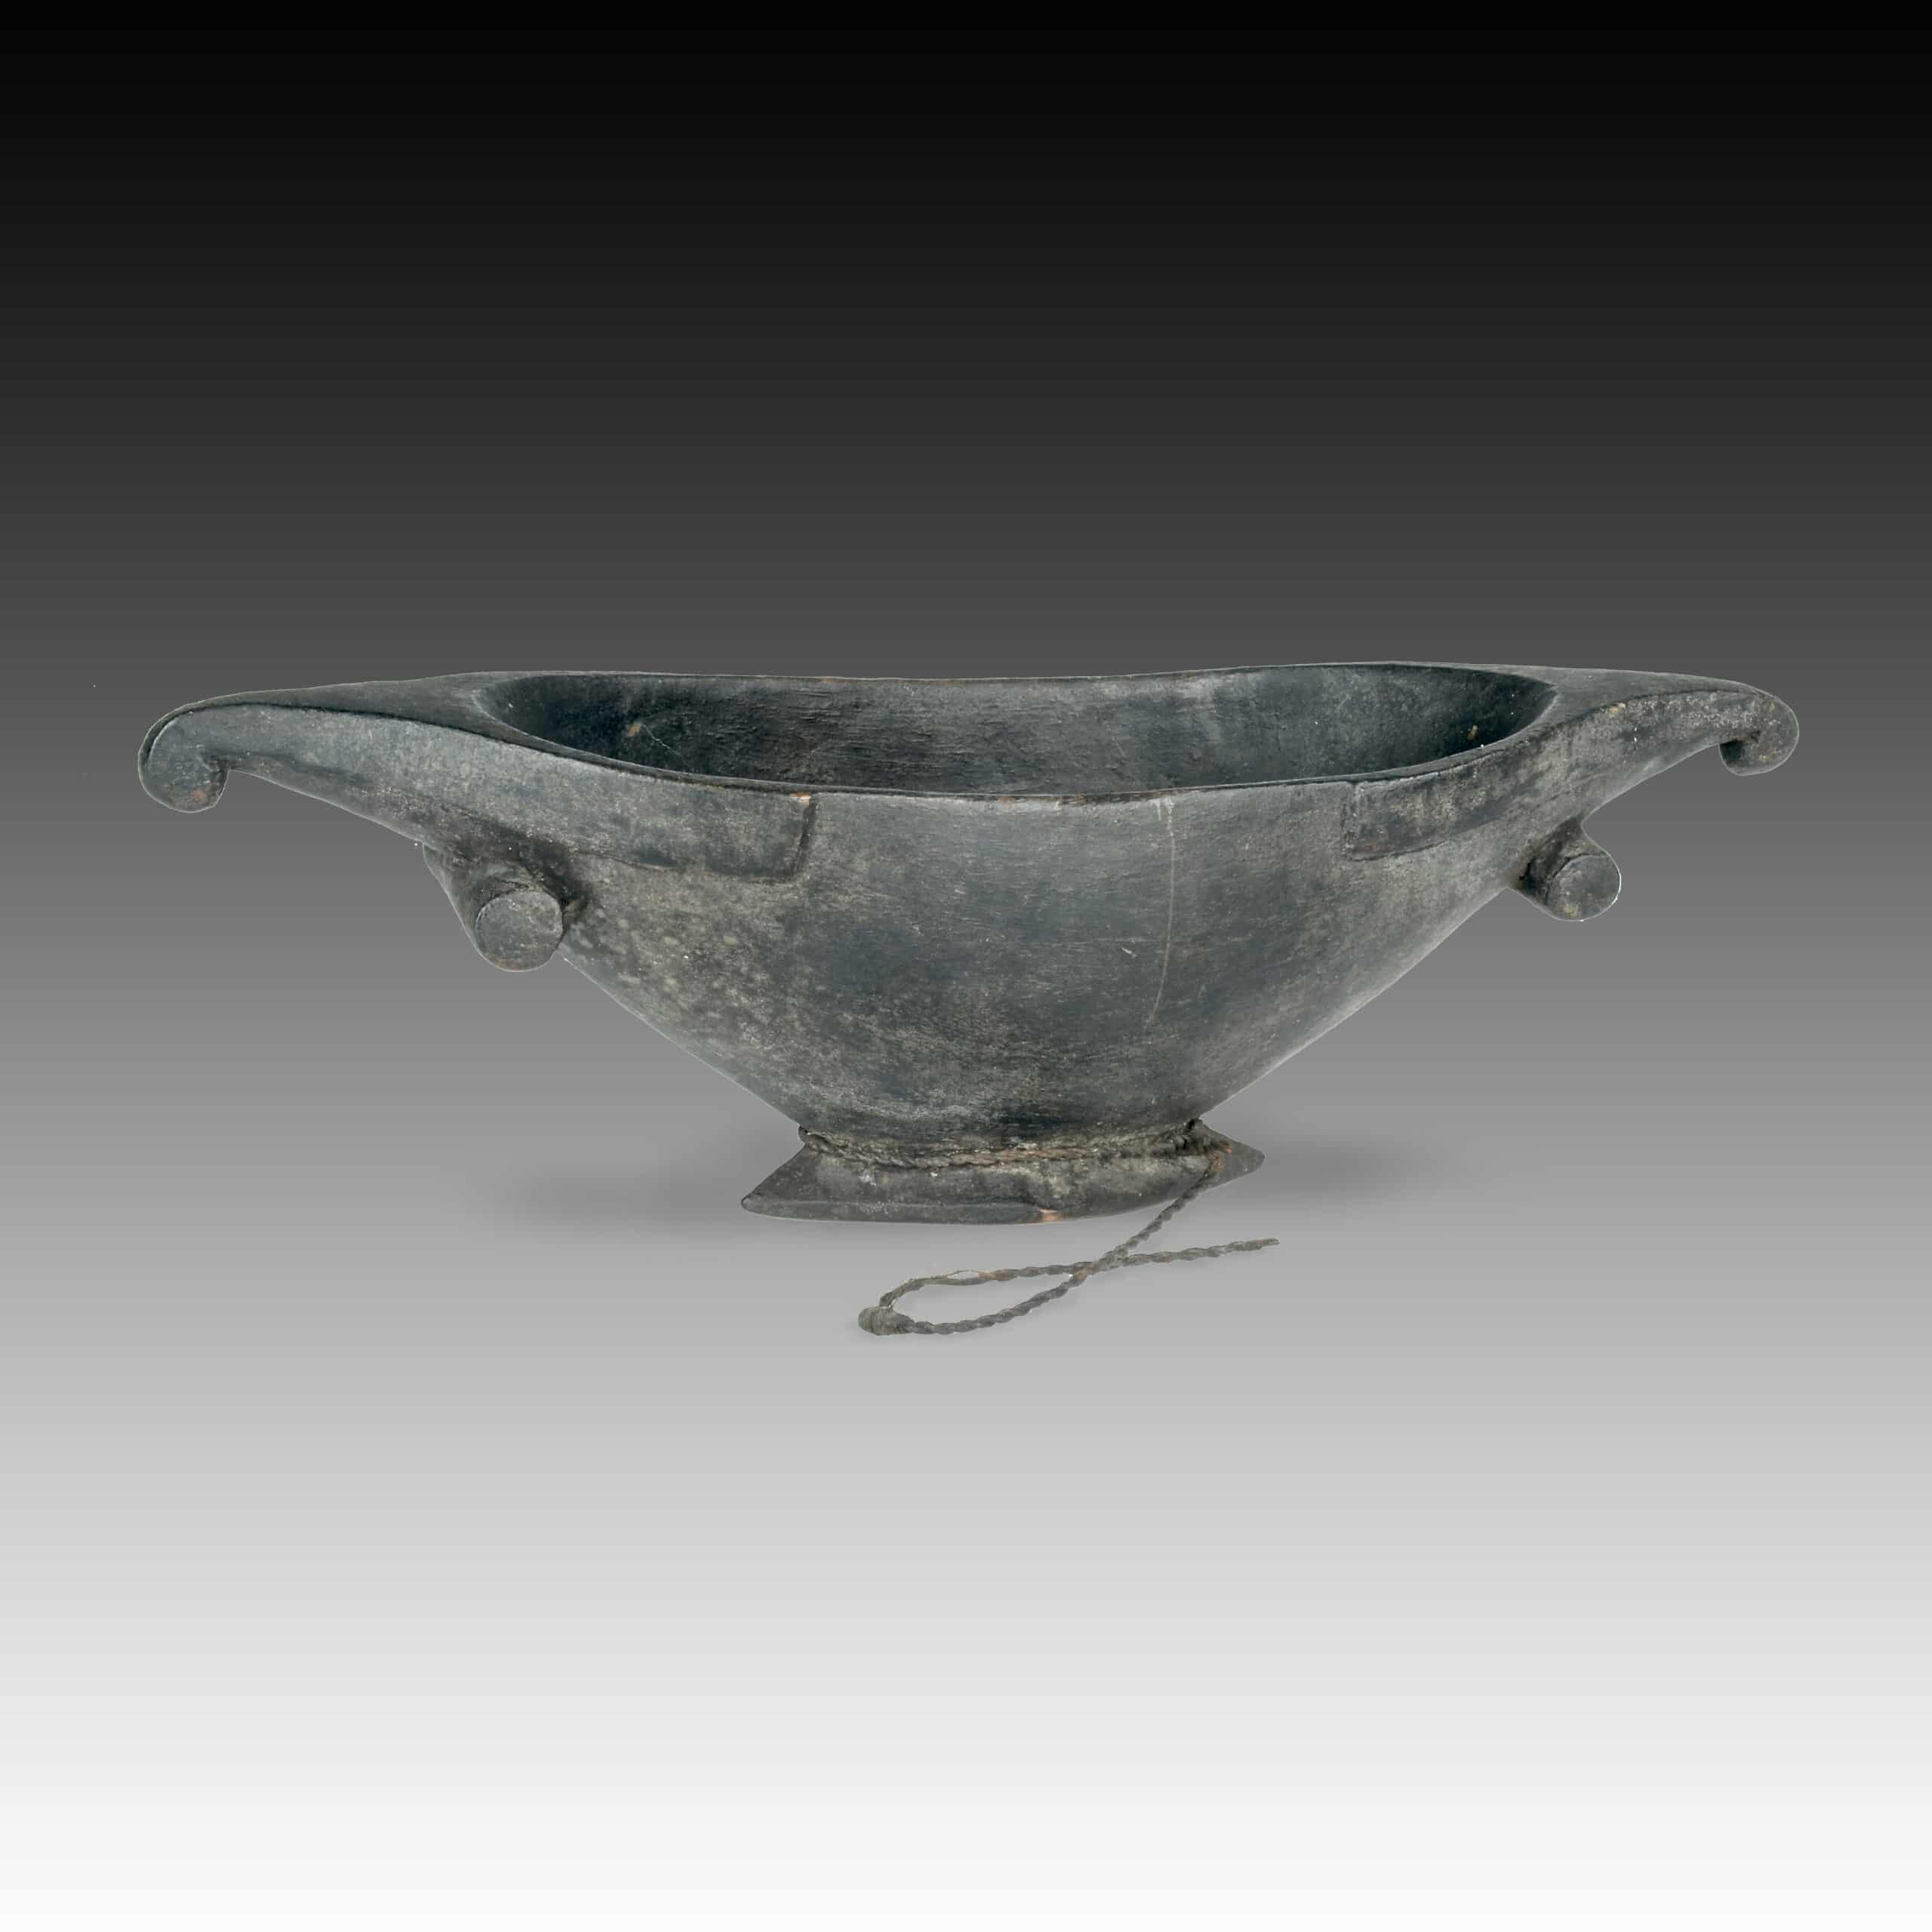 A Solomon Island bowl